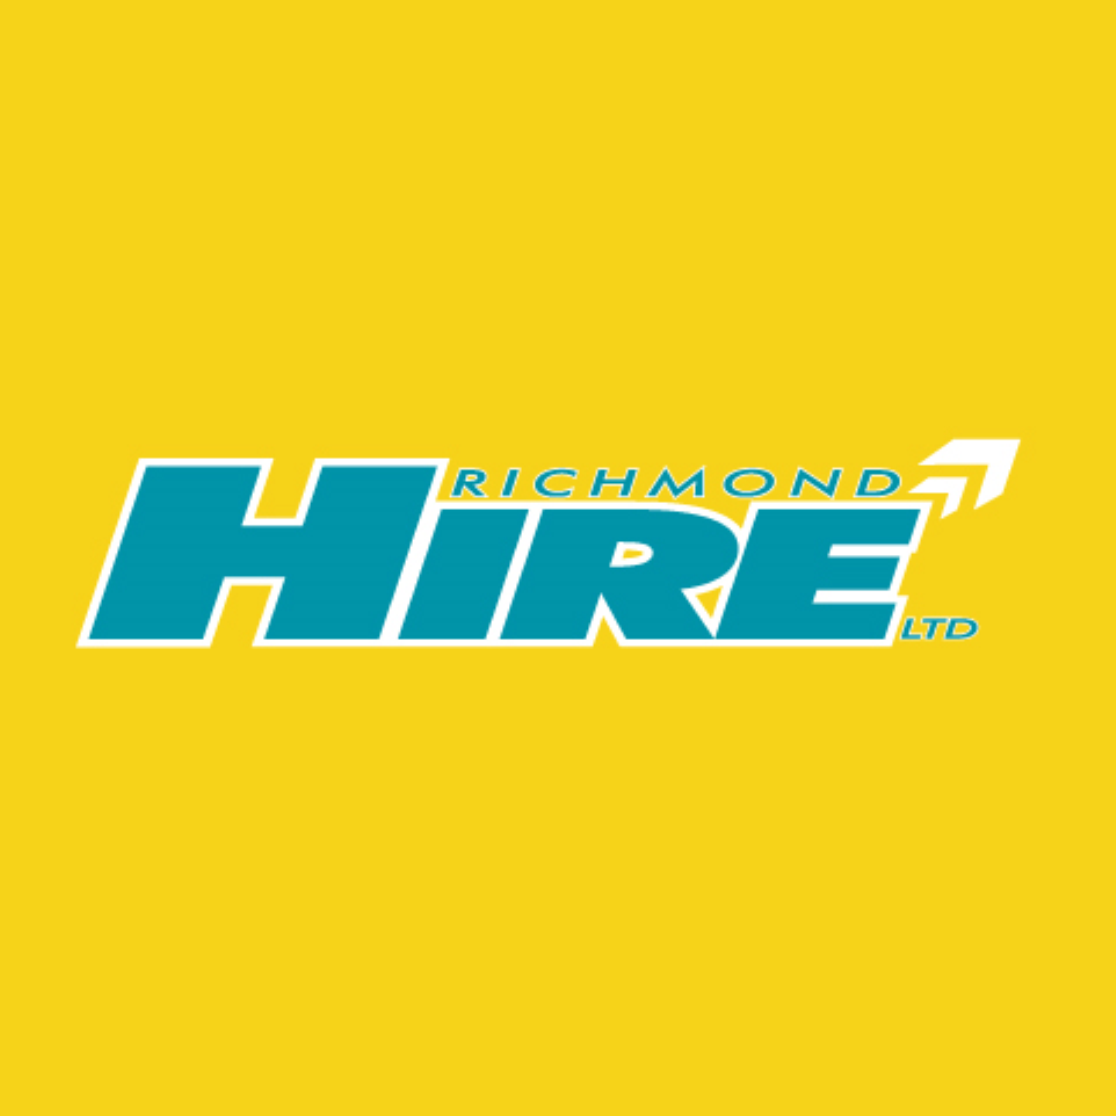 richmond hire.png